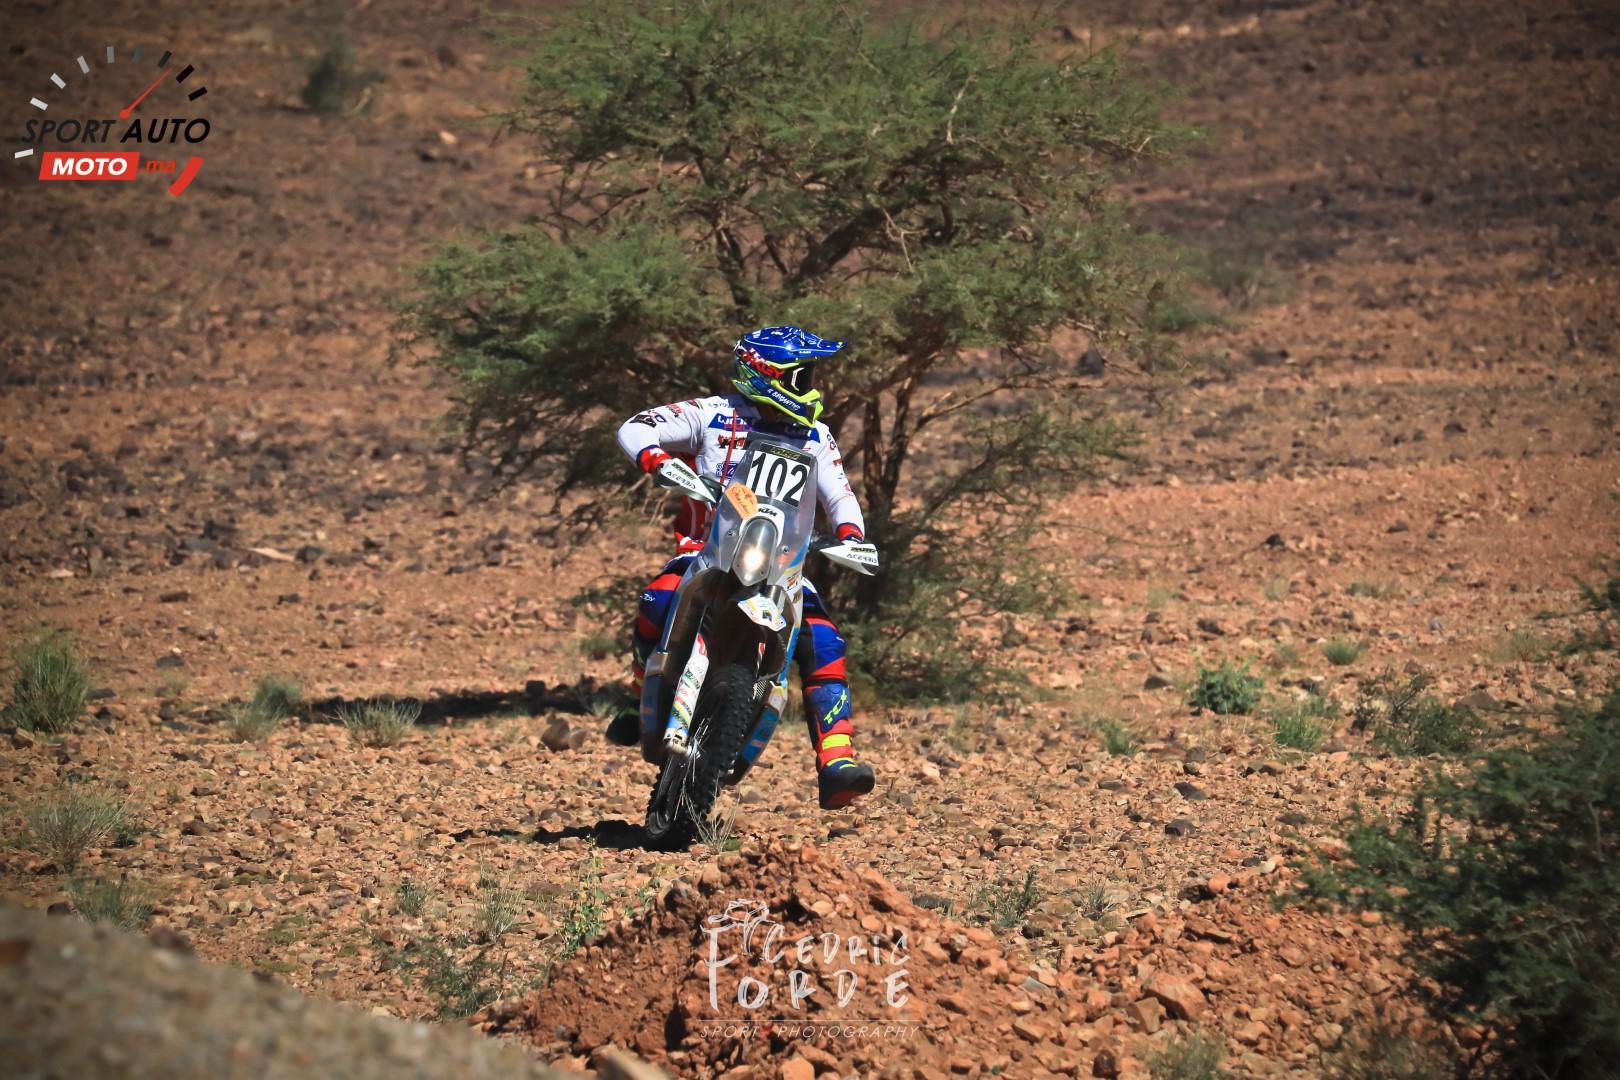 hearts-of-morocco-2018-besson-et-ivan-remportent-l-etape-3-etape-4-annulee-894-2.jpg